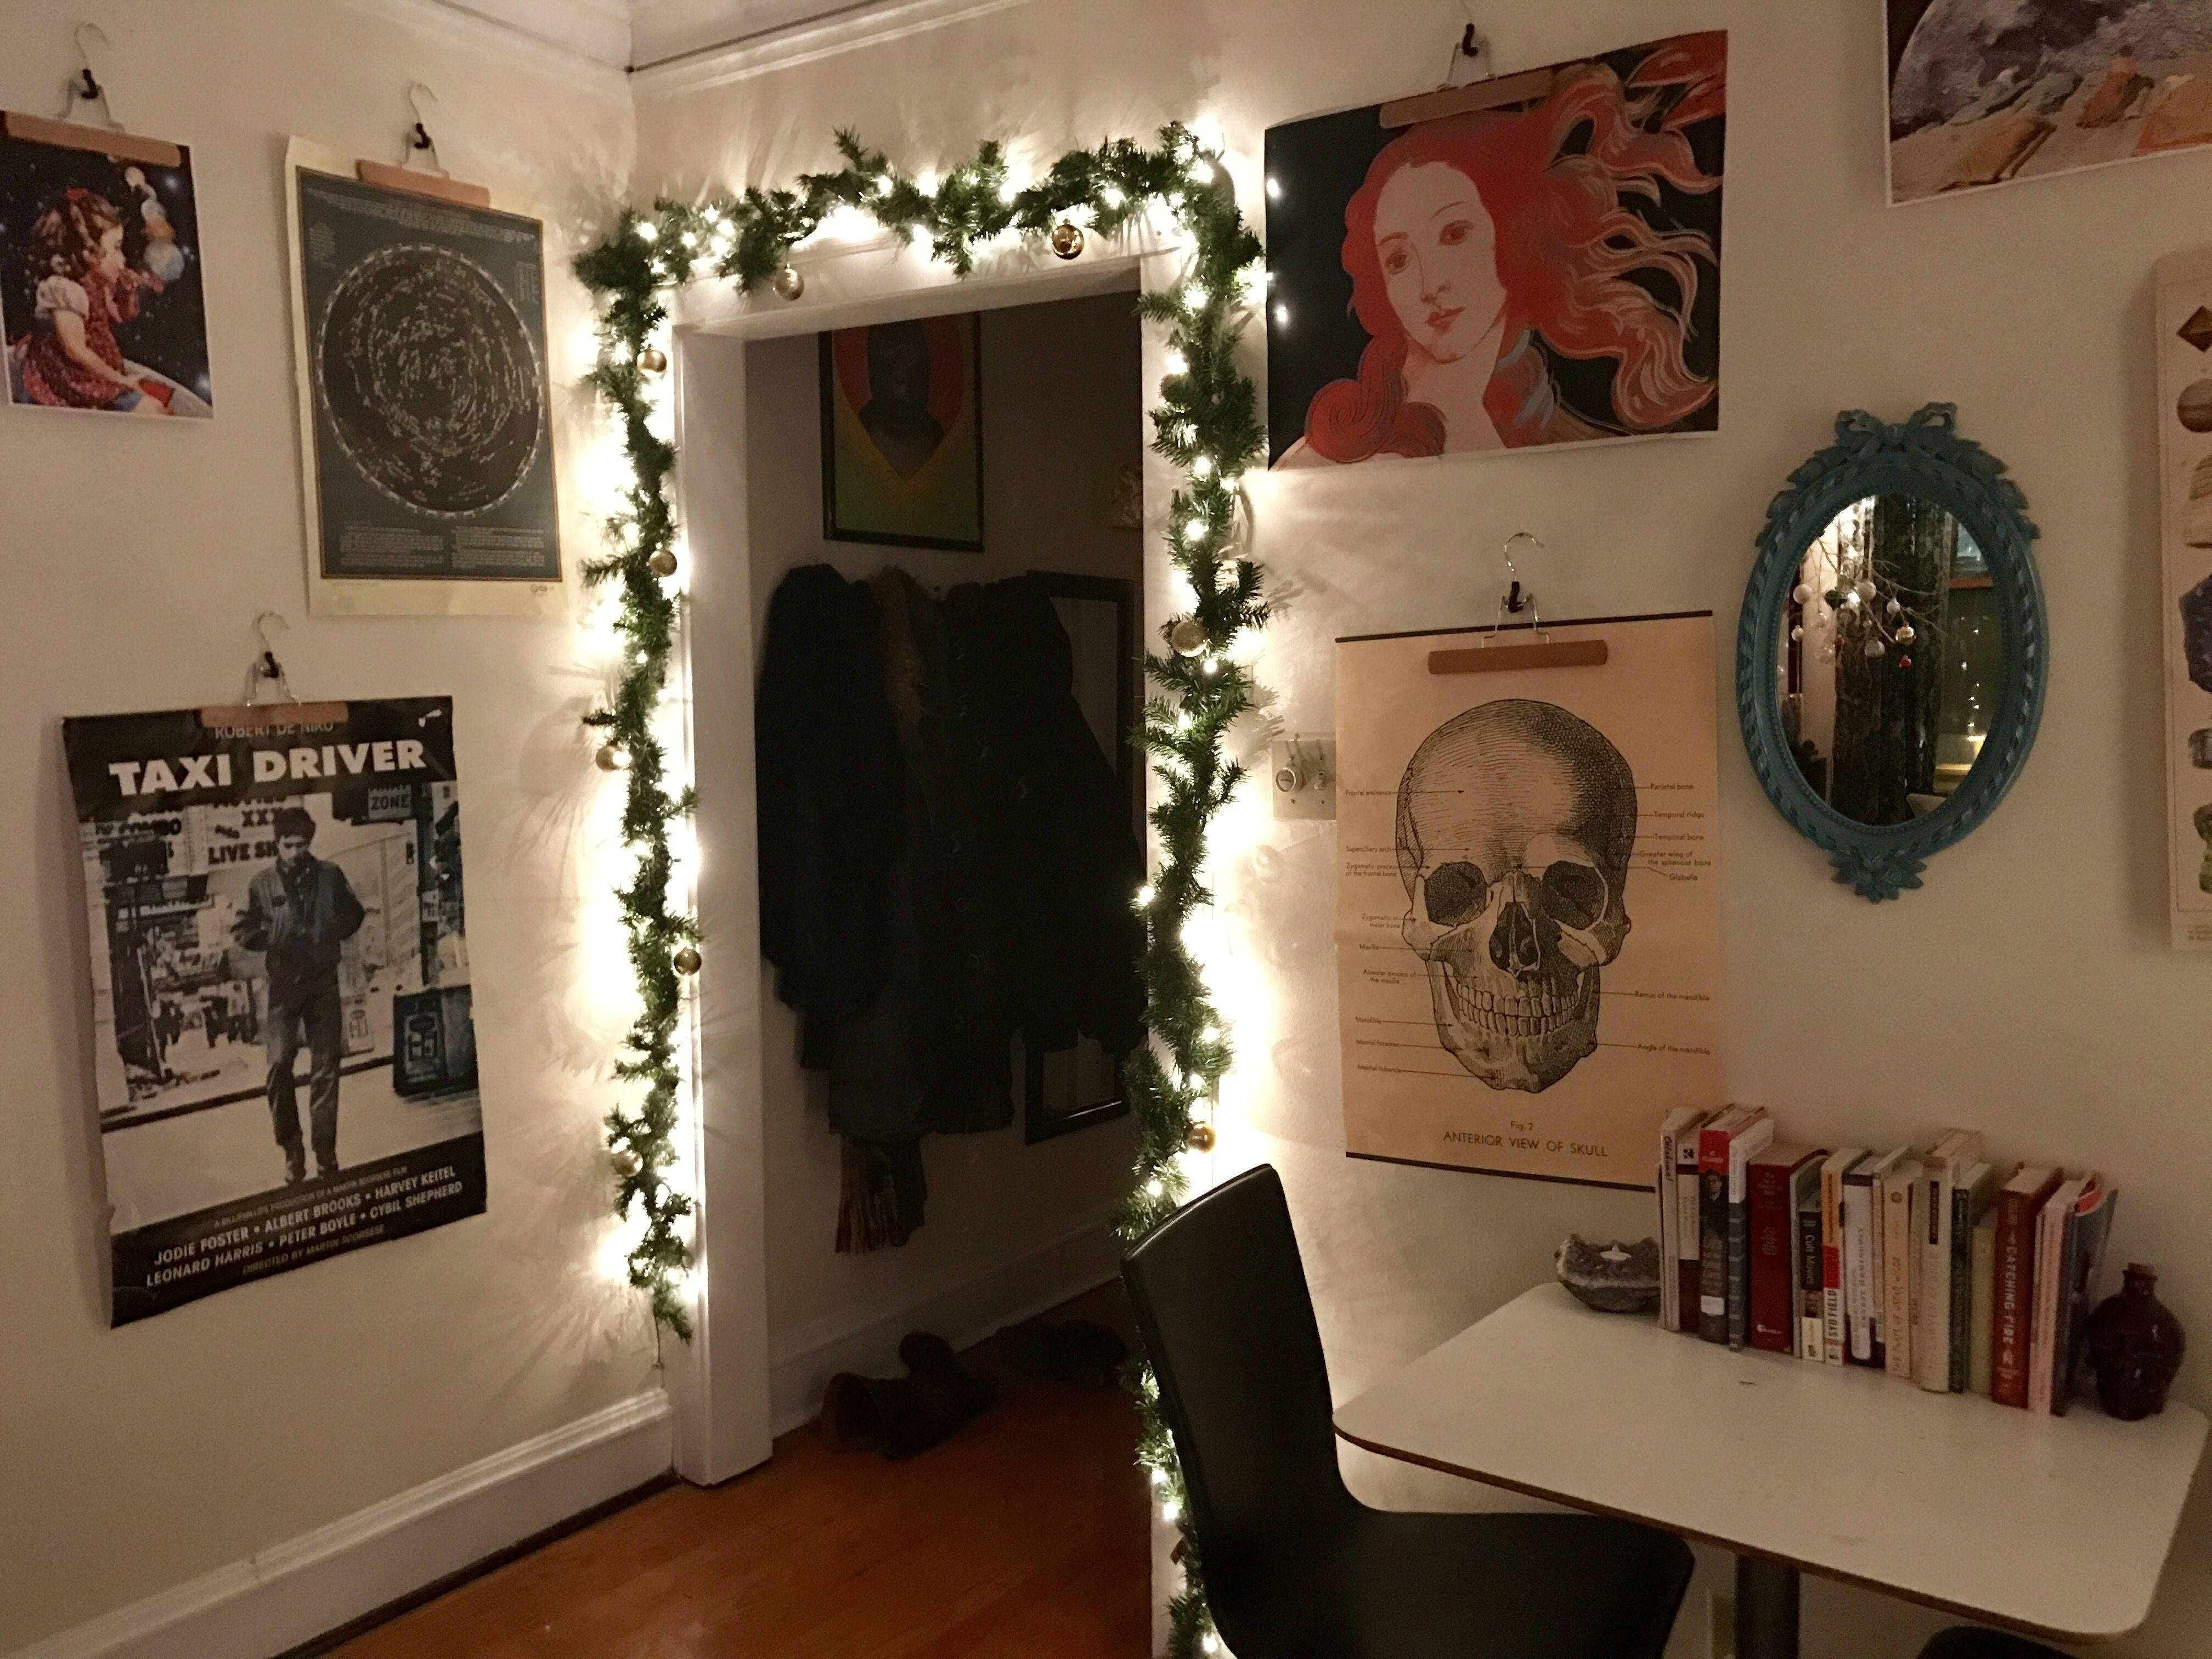 Cozy Christmas apartment 2016. | Christmas apartment, Cozy ...